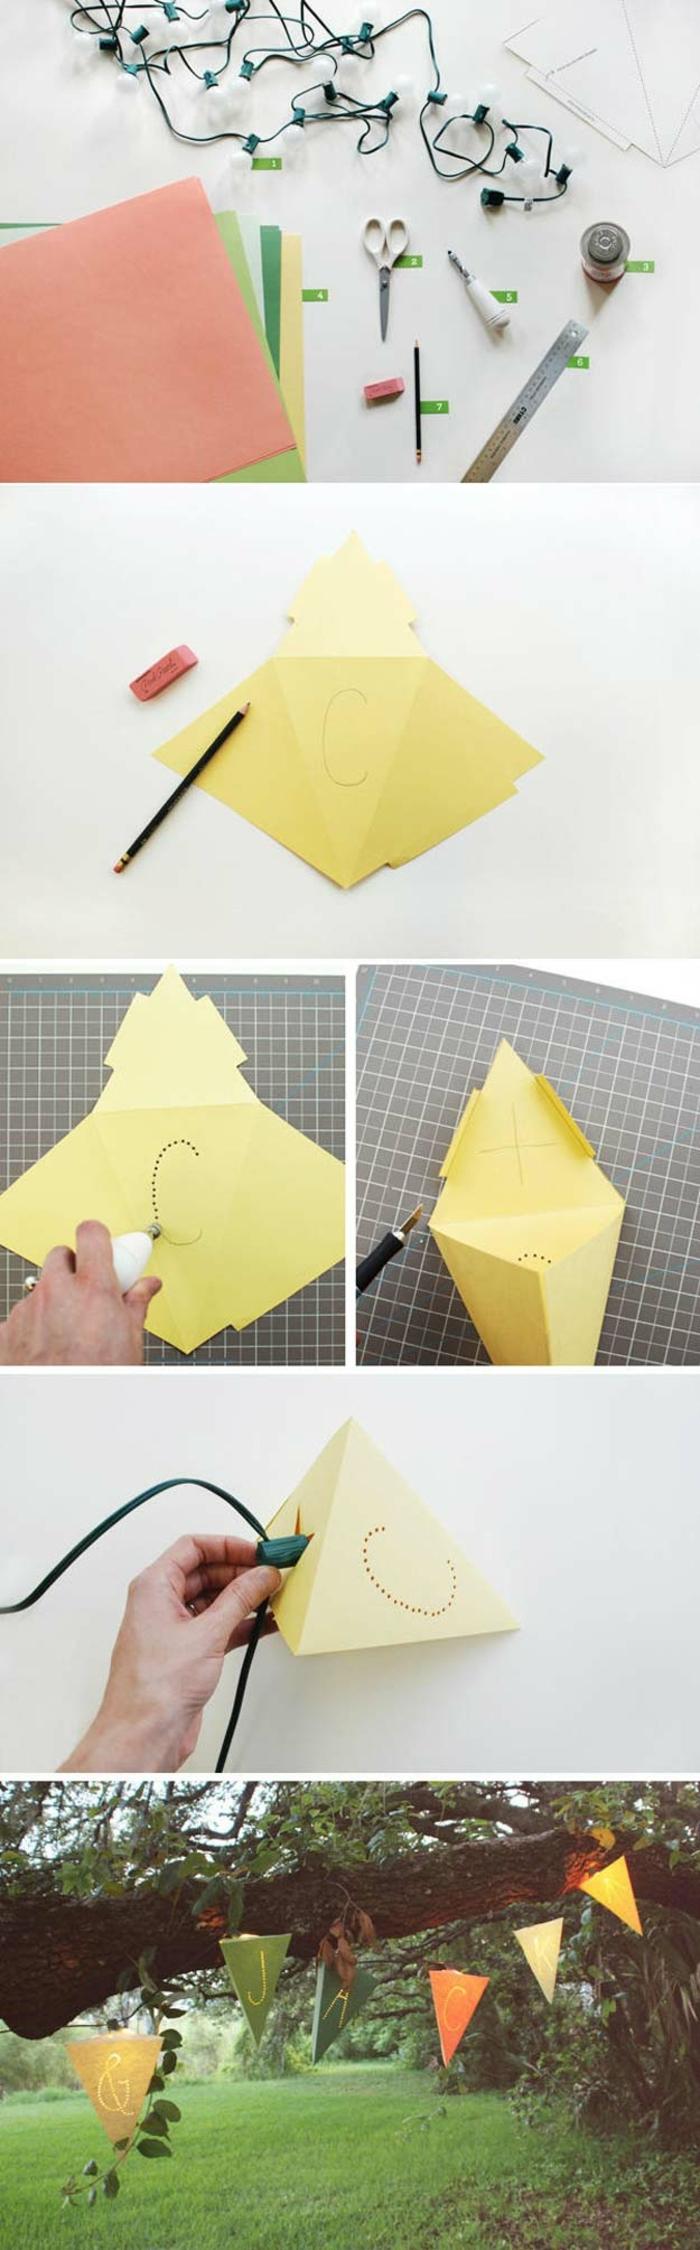 suspension origami, décoration pour une fête, guirlande lumineuse, tuto origami